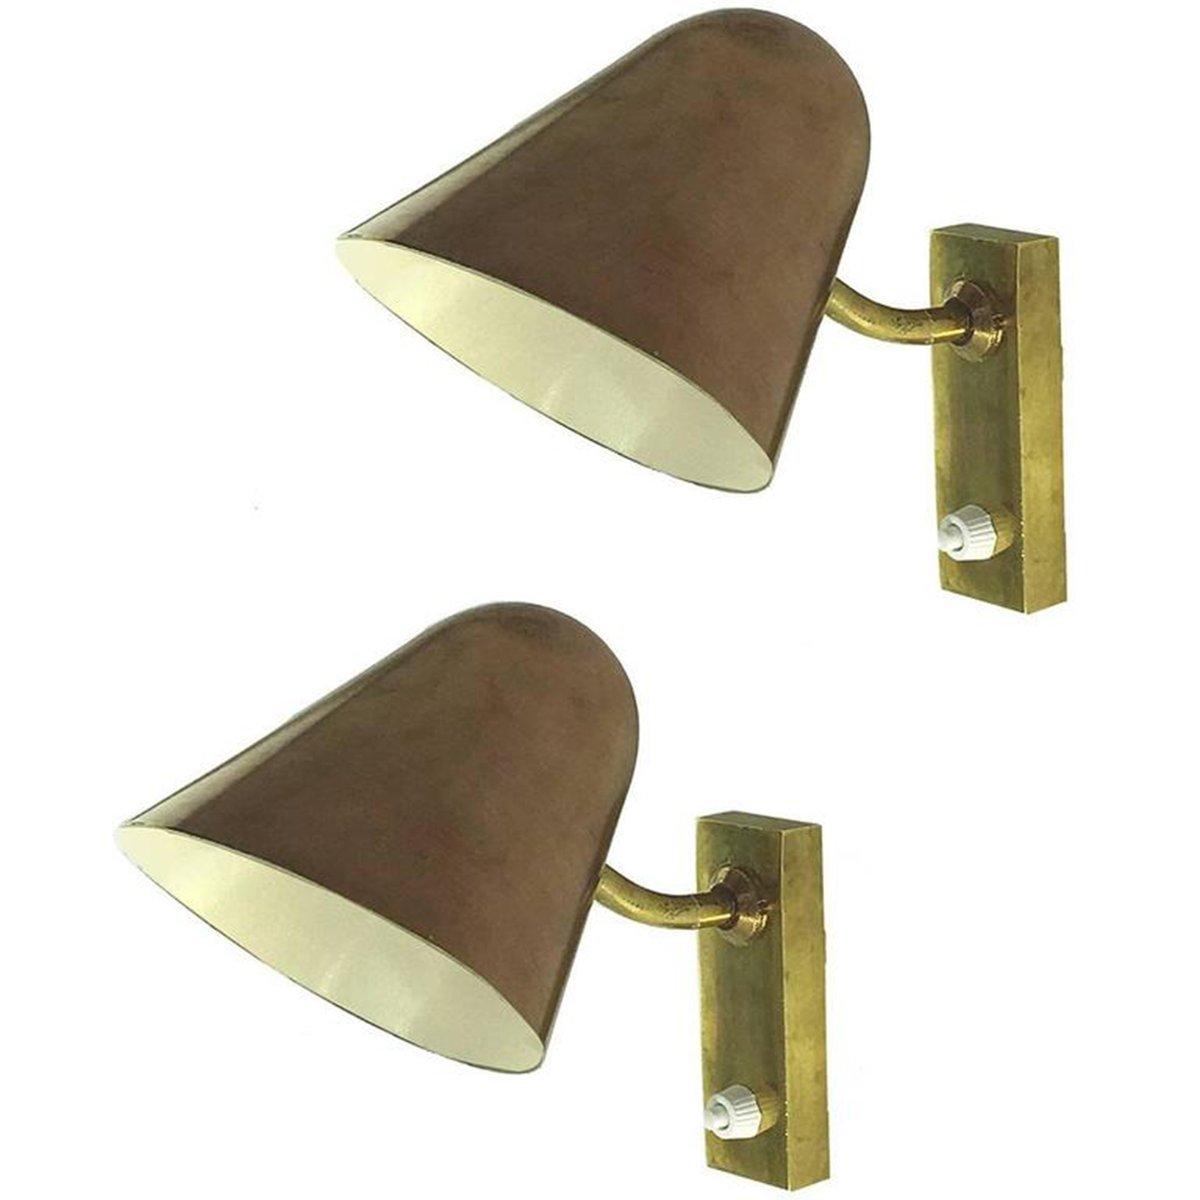 lamp lasalle bronze rubbed p sconce oil htm